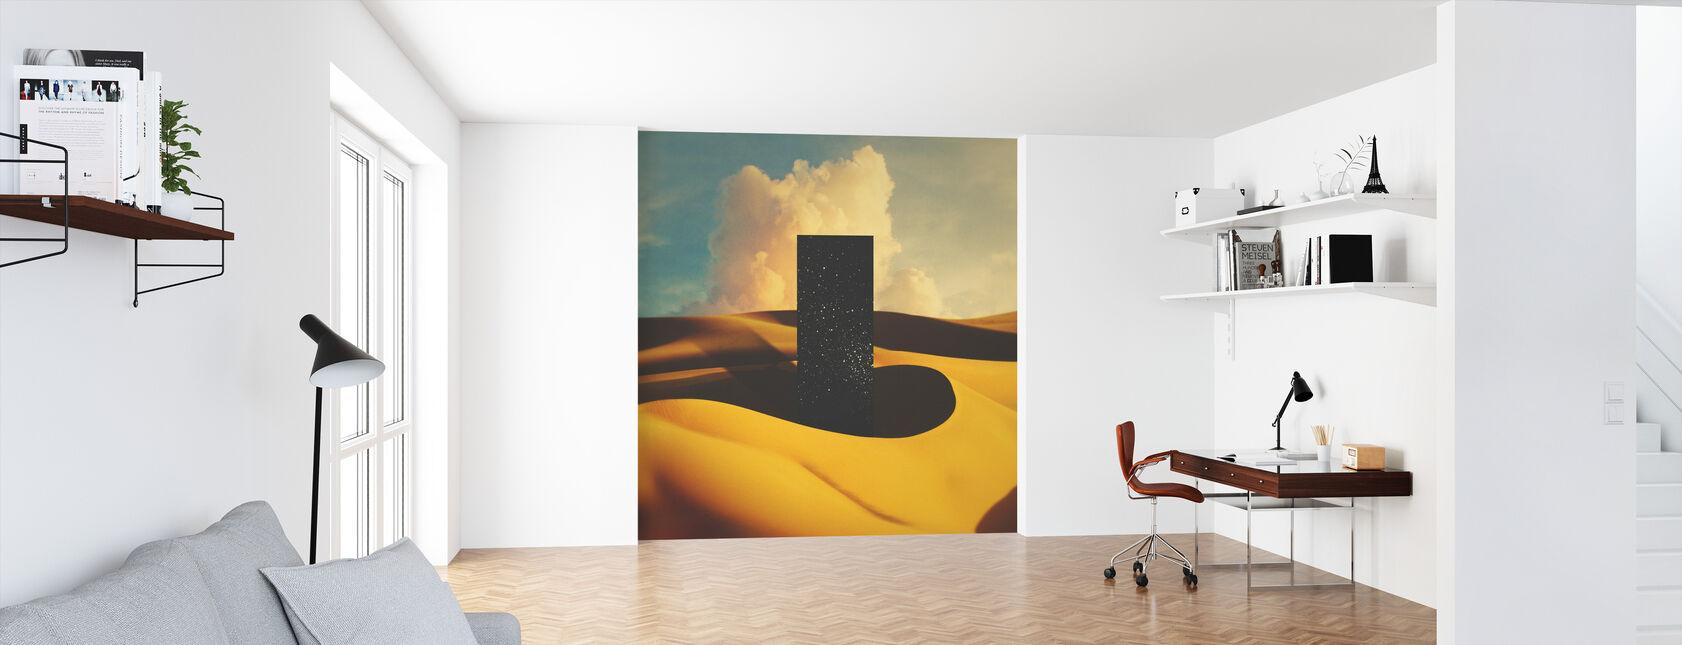 Monolith - Wallpaper - Office